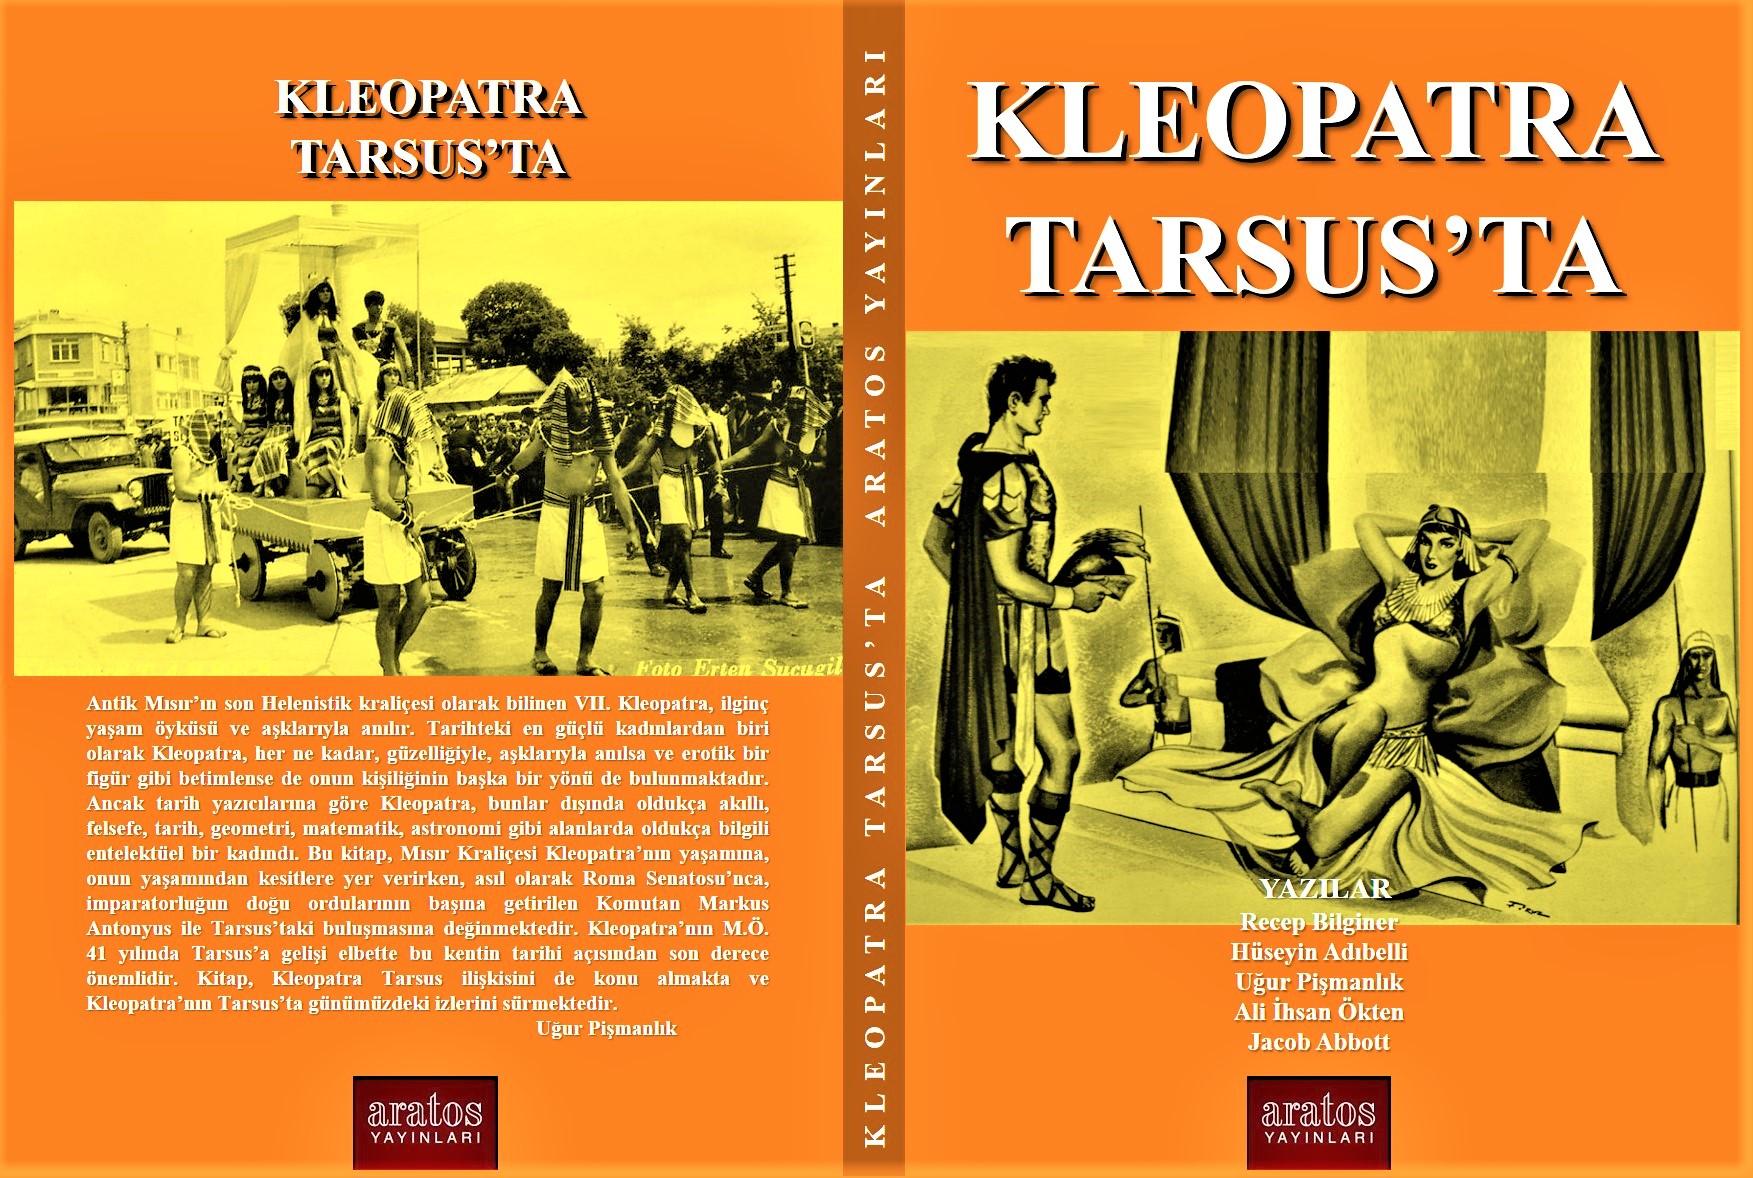 KLEOPTRA TARSUS'TA KİTABI ARATOS YAYINLARINDAN ÇIKTI